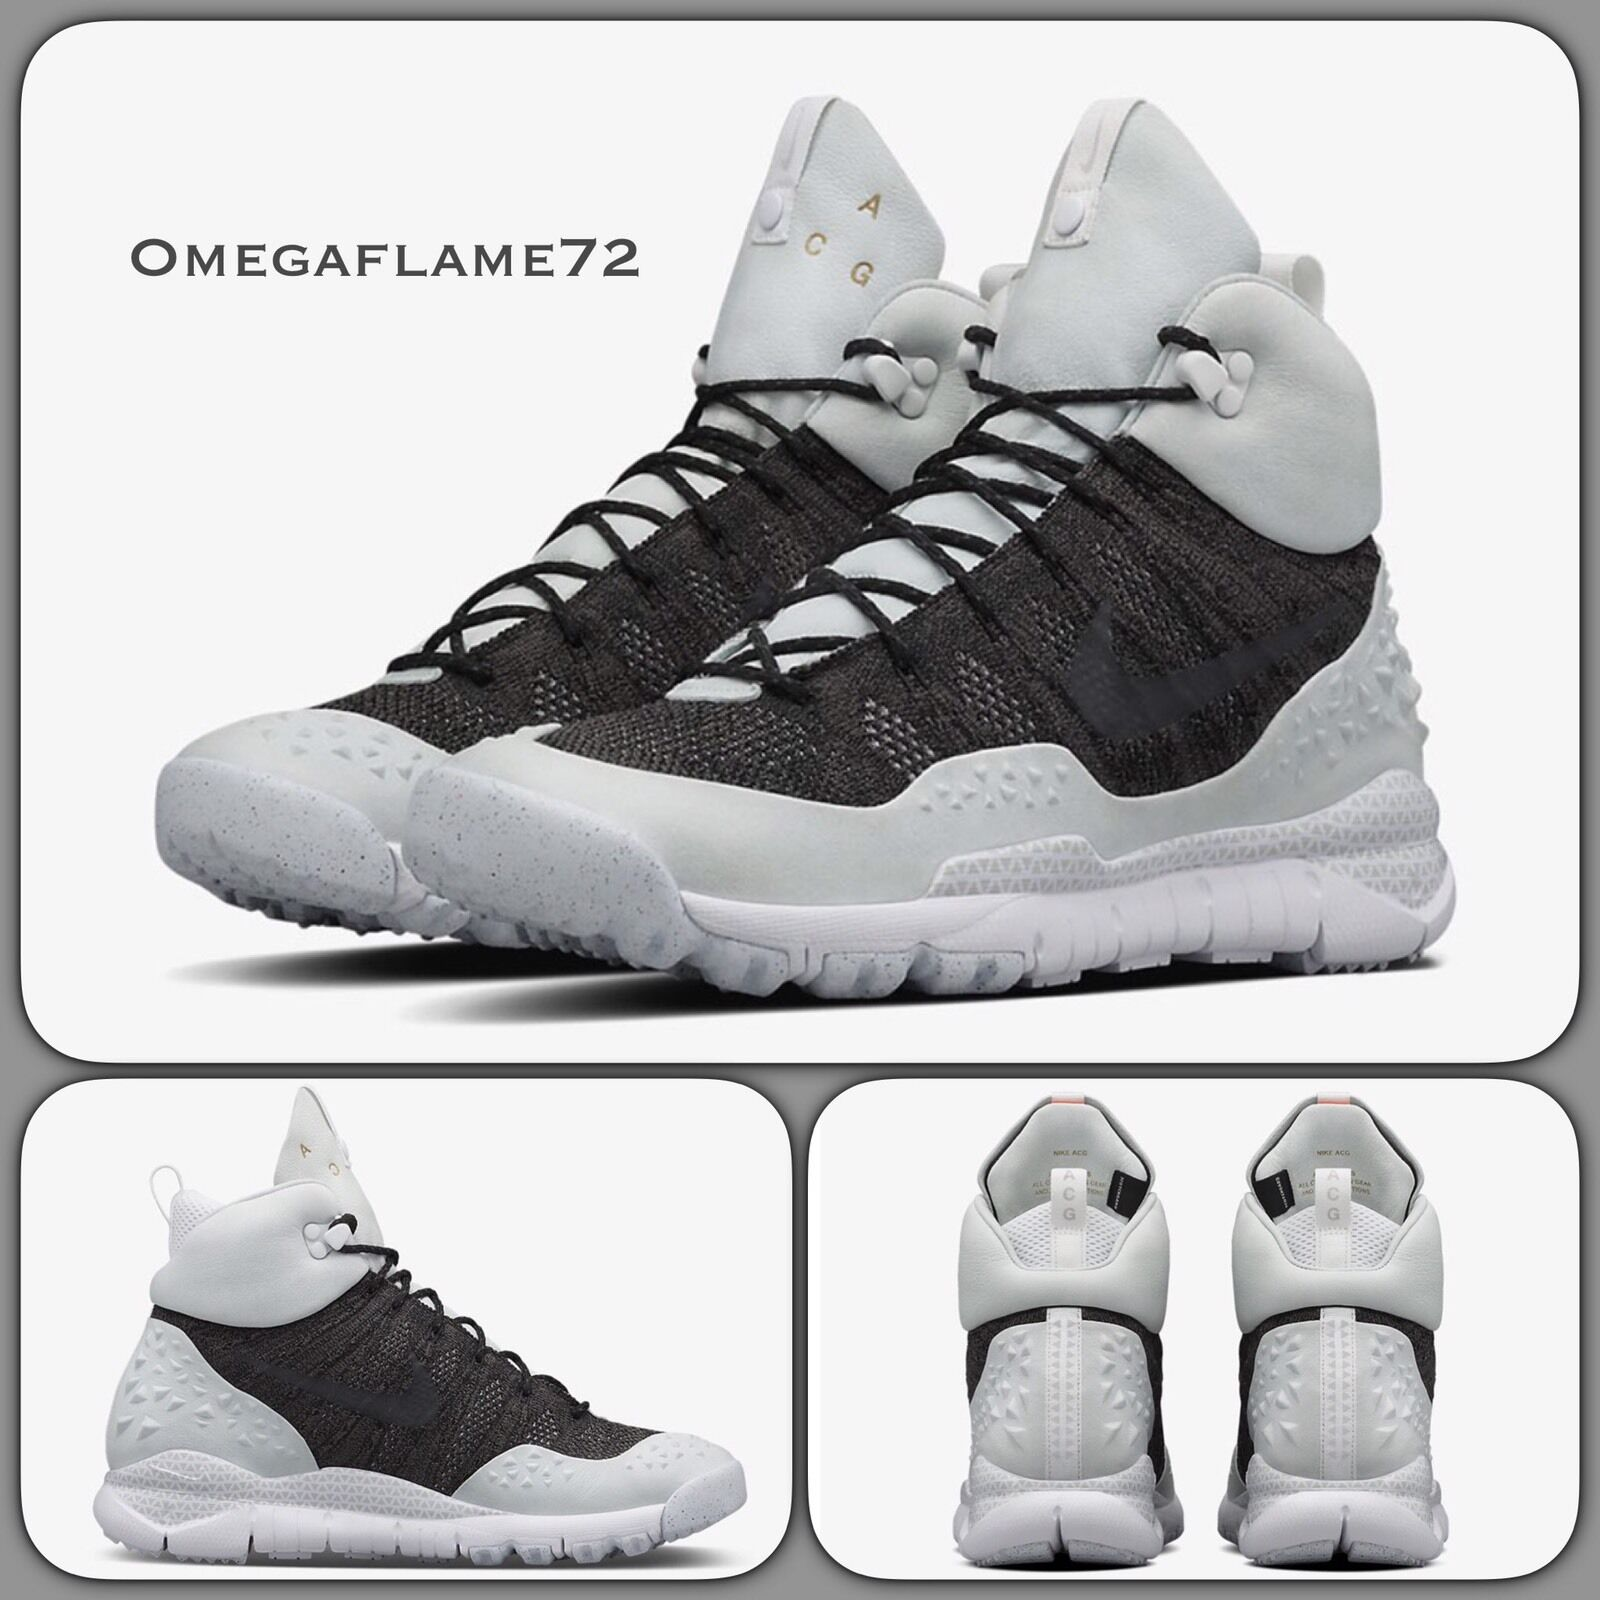 Nike Lupinek Flyknit ACG Nero 826077-002 EUR 37.5 USA 5 Nero ACG Bianco b9c2e7